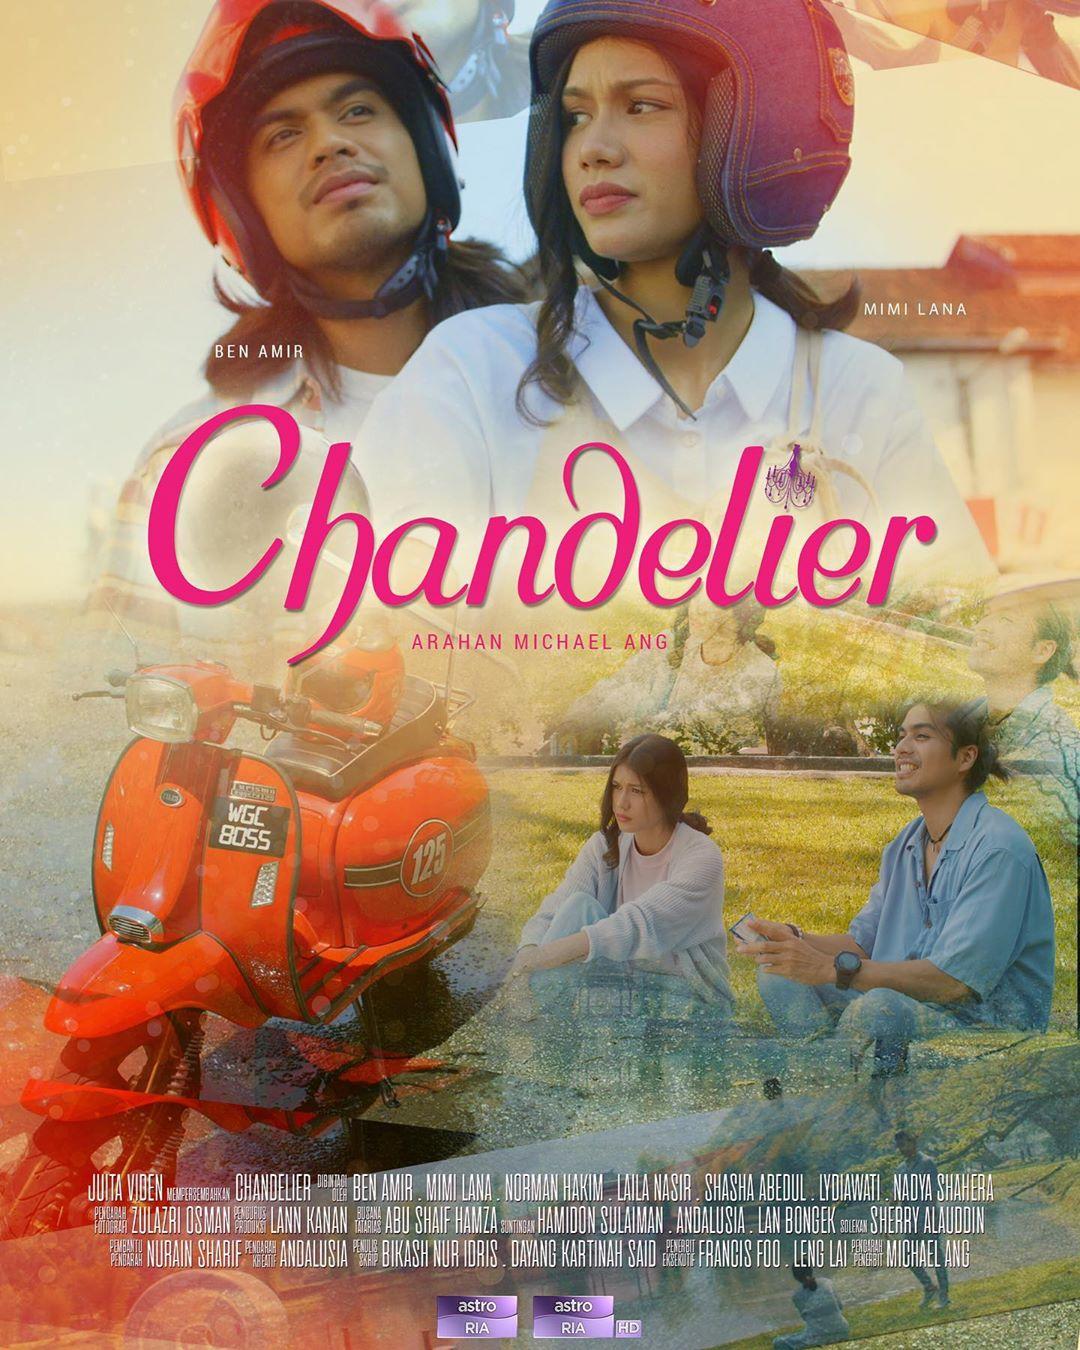 Chandelier (2020) Astro Ria